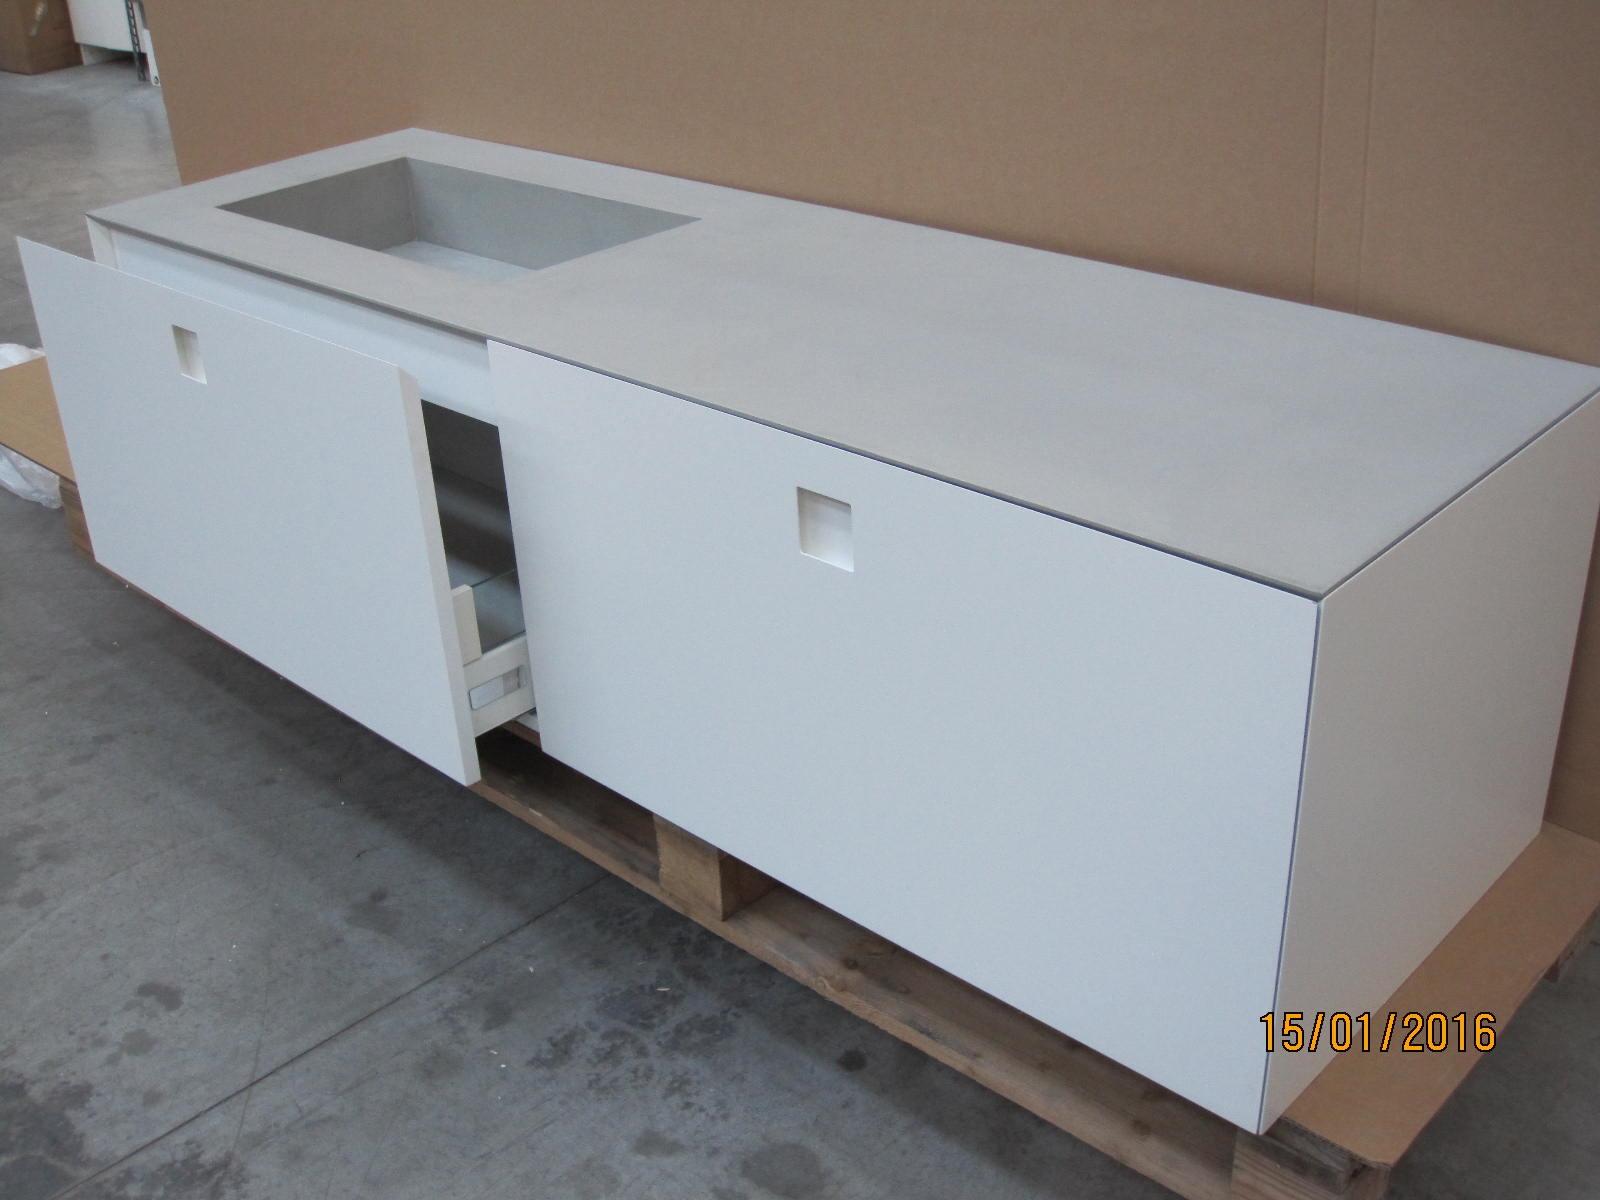 arlex kube bianco opaco moderno laccato opaco sospeso - arredo ... - Arlex Arredo Bagno